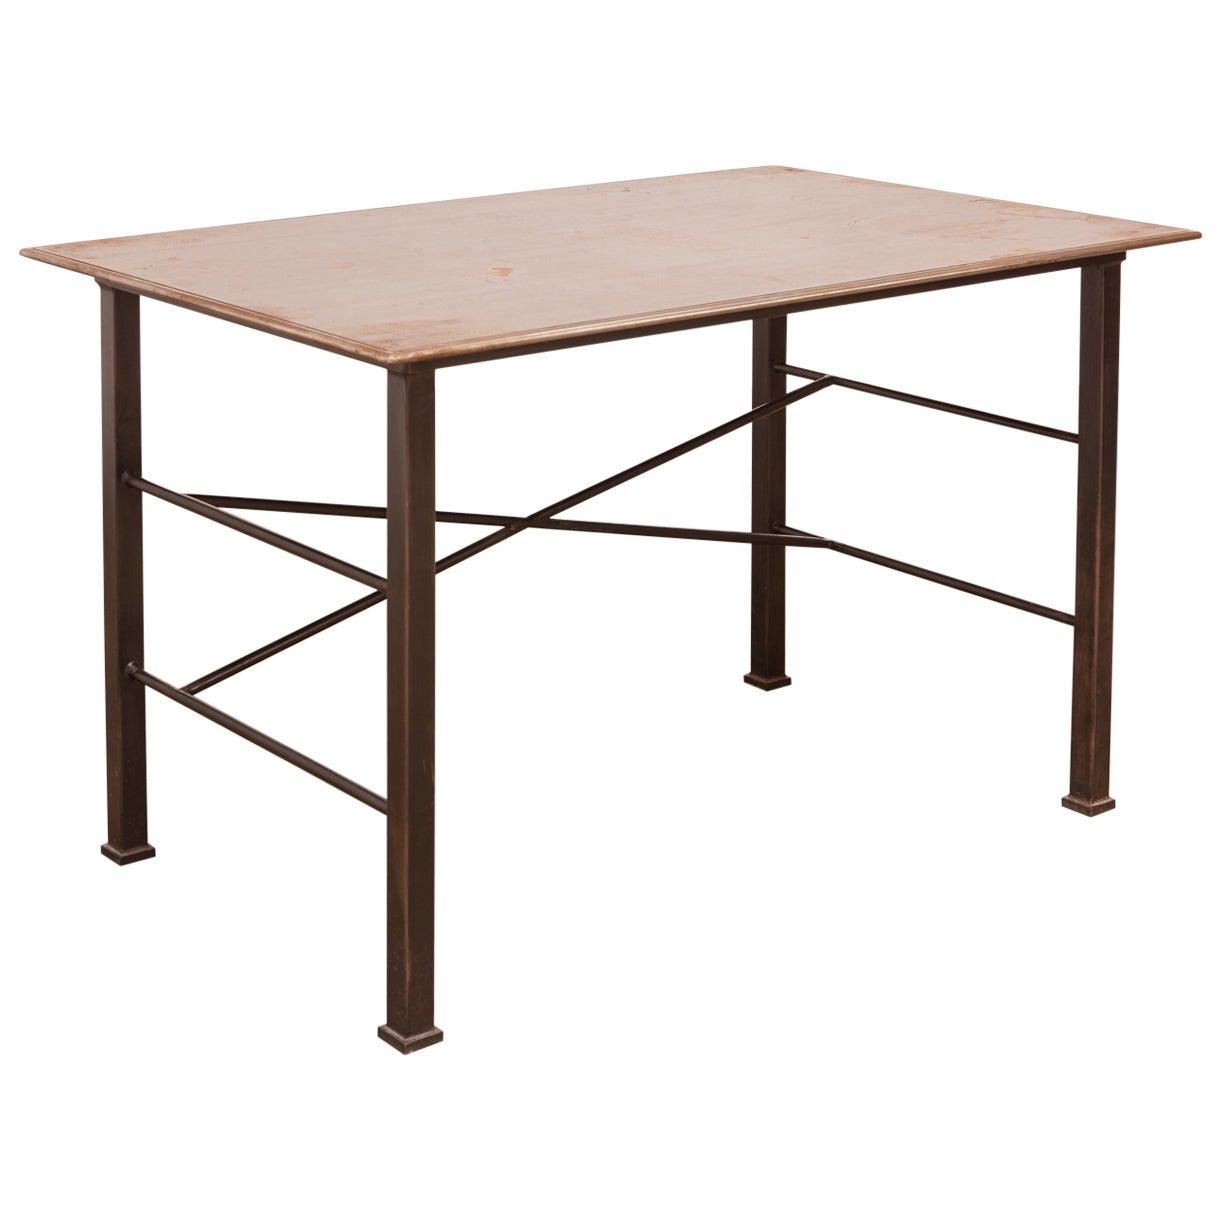 Modern Industrial Steel Desk Work Table